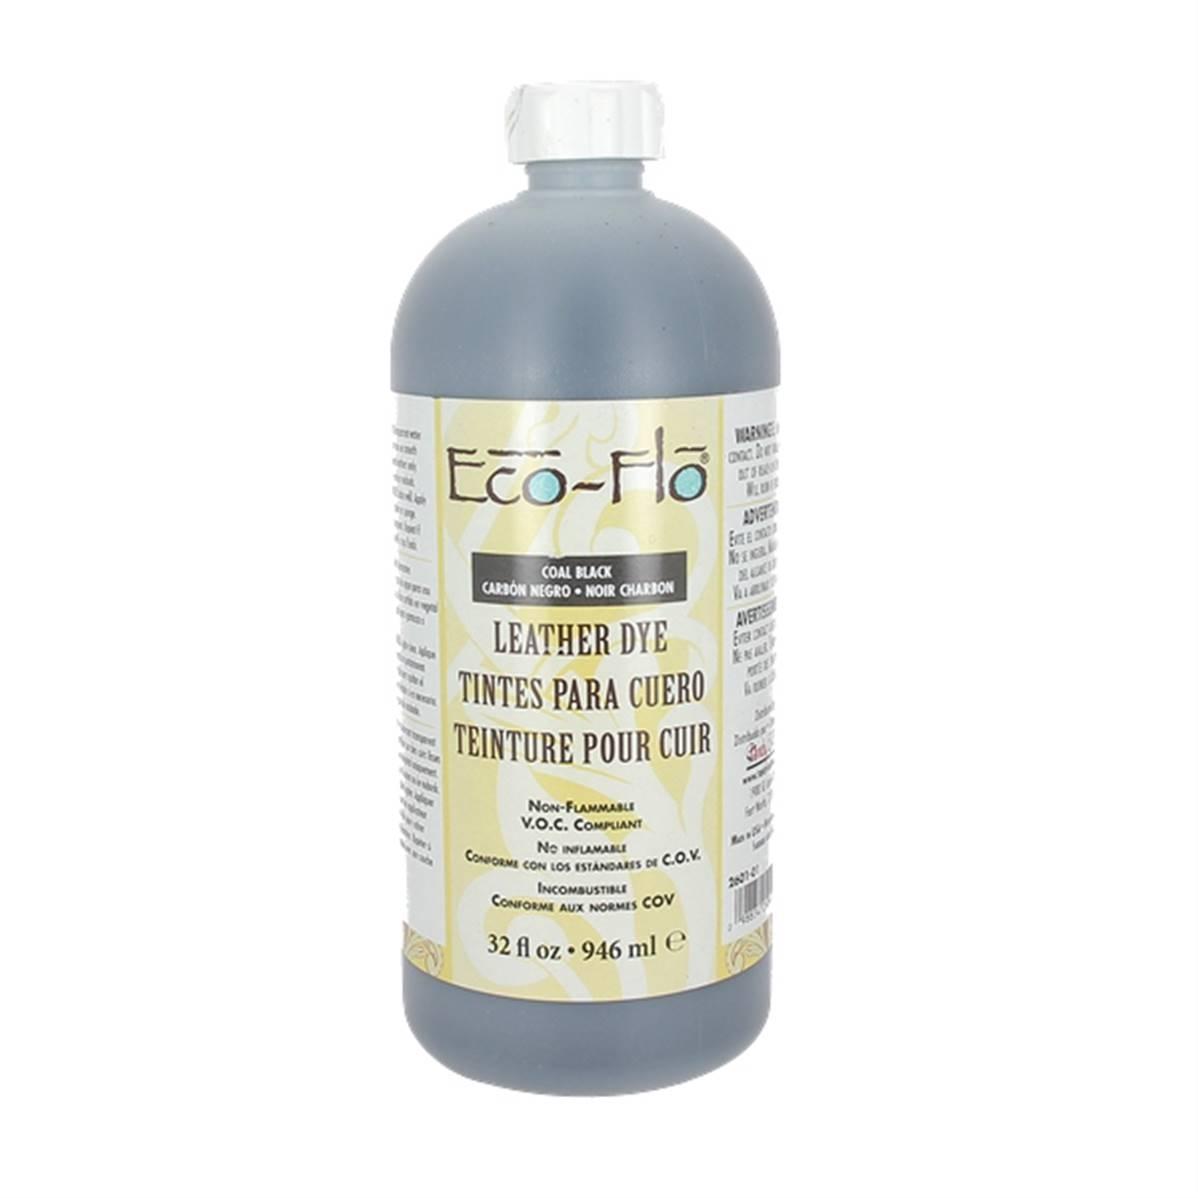 Teinture base aqueuse - Eco-Flo - 946ml - NOIR CHARBON